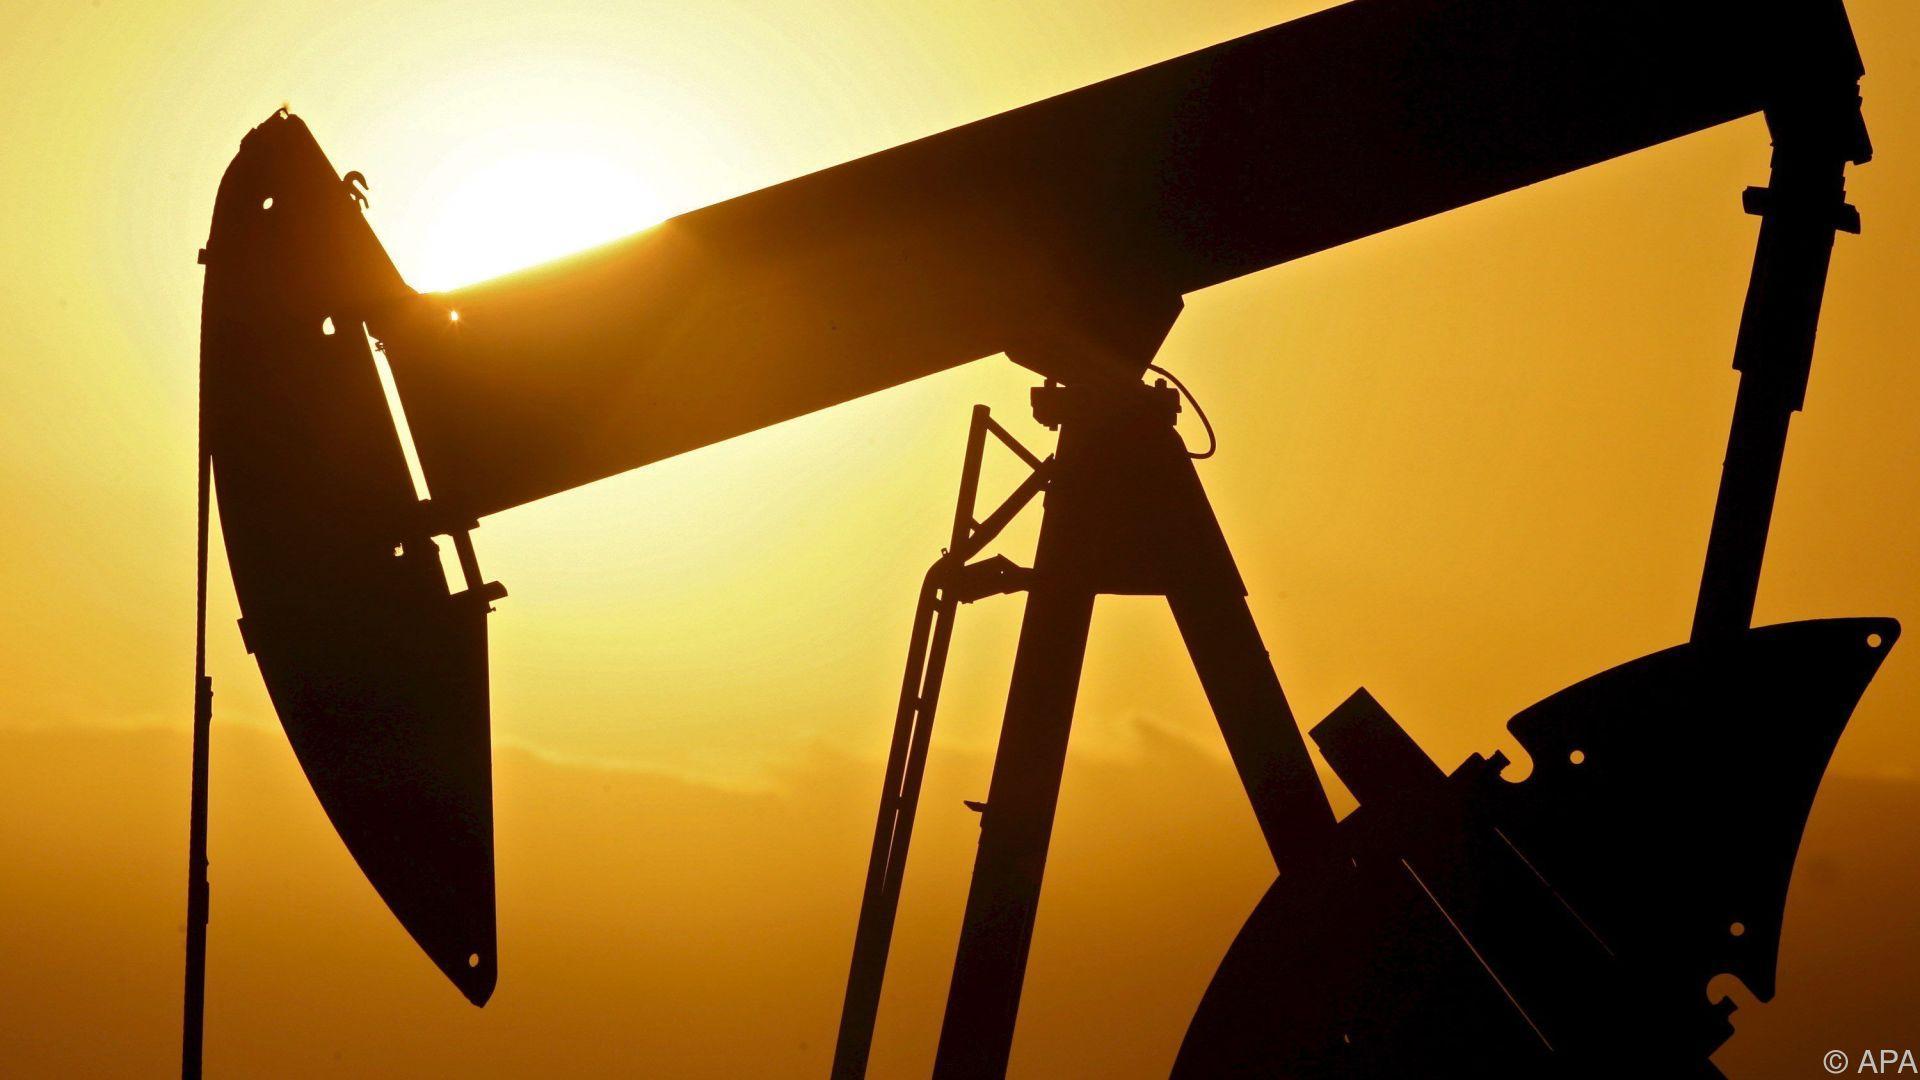 Ölverbraucht 2020 um 9 Prozent niedriger